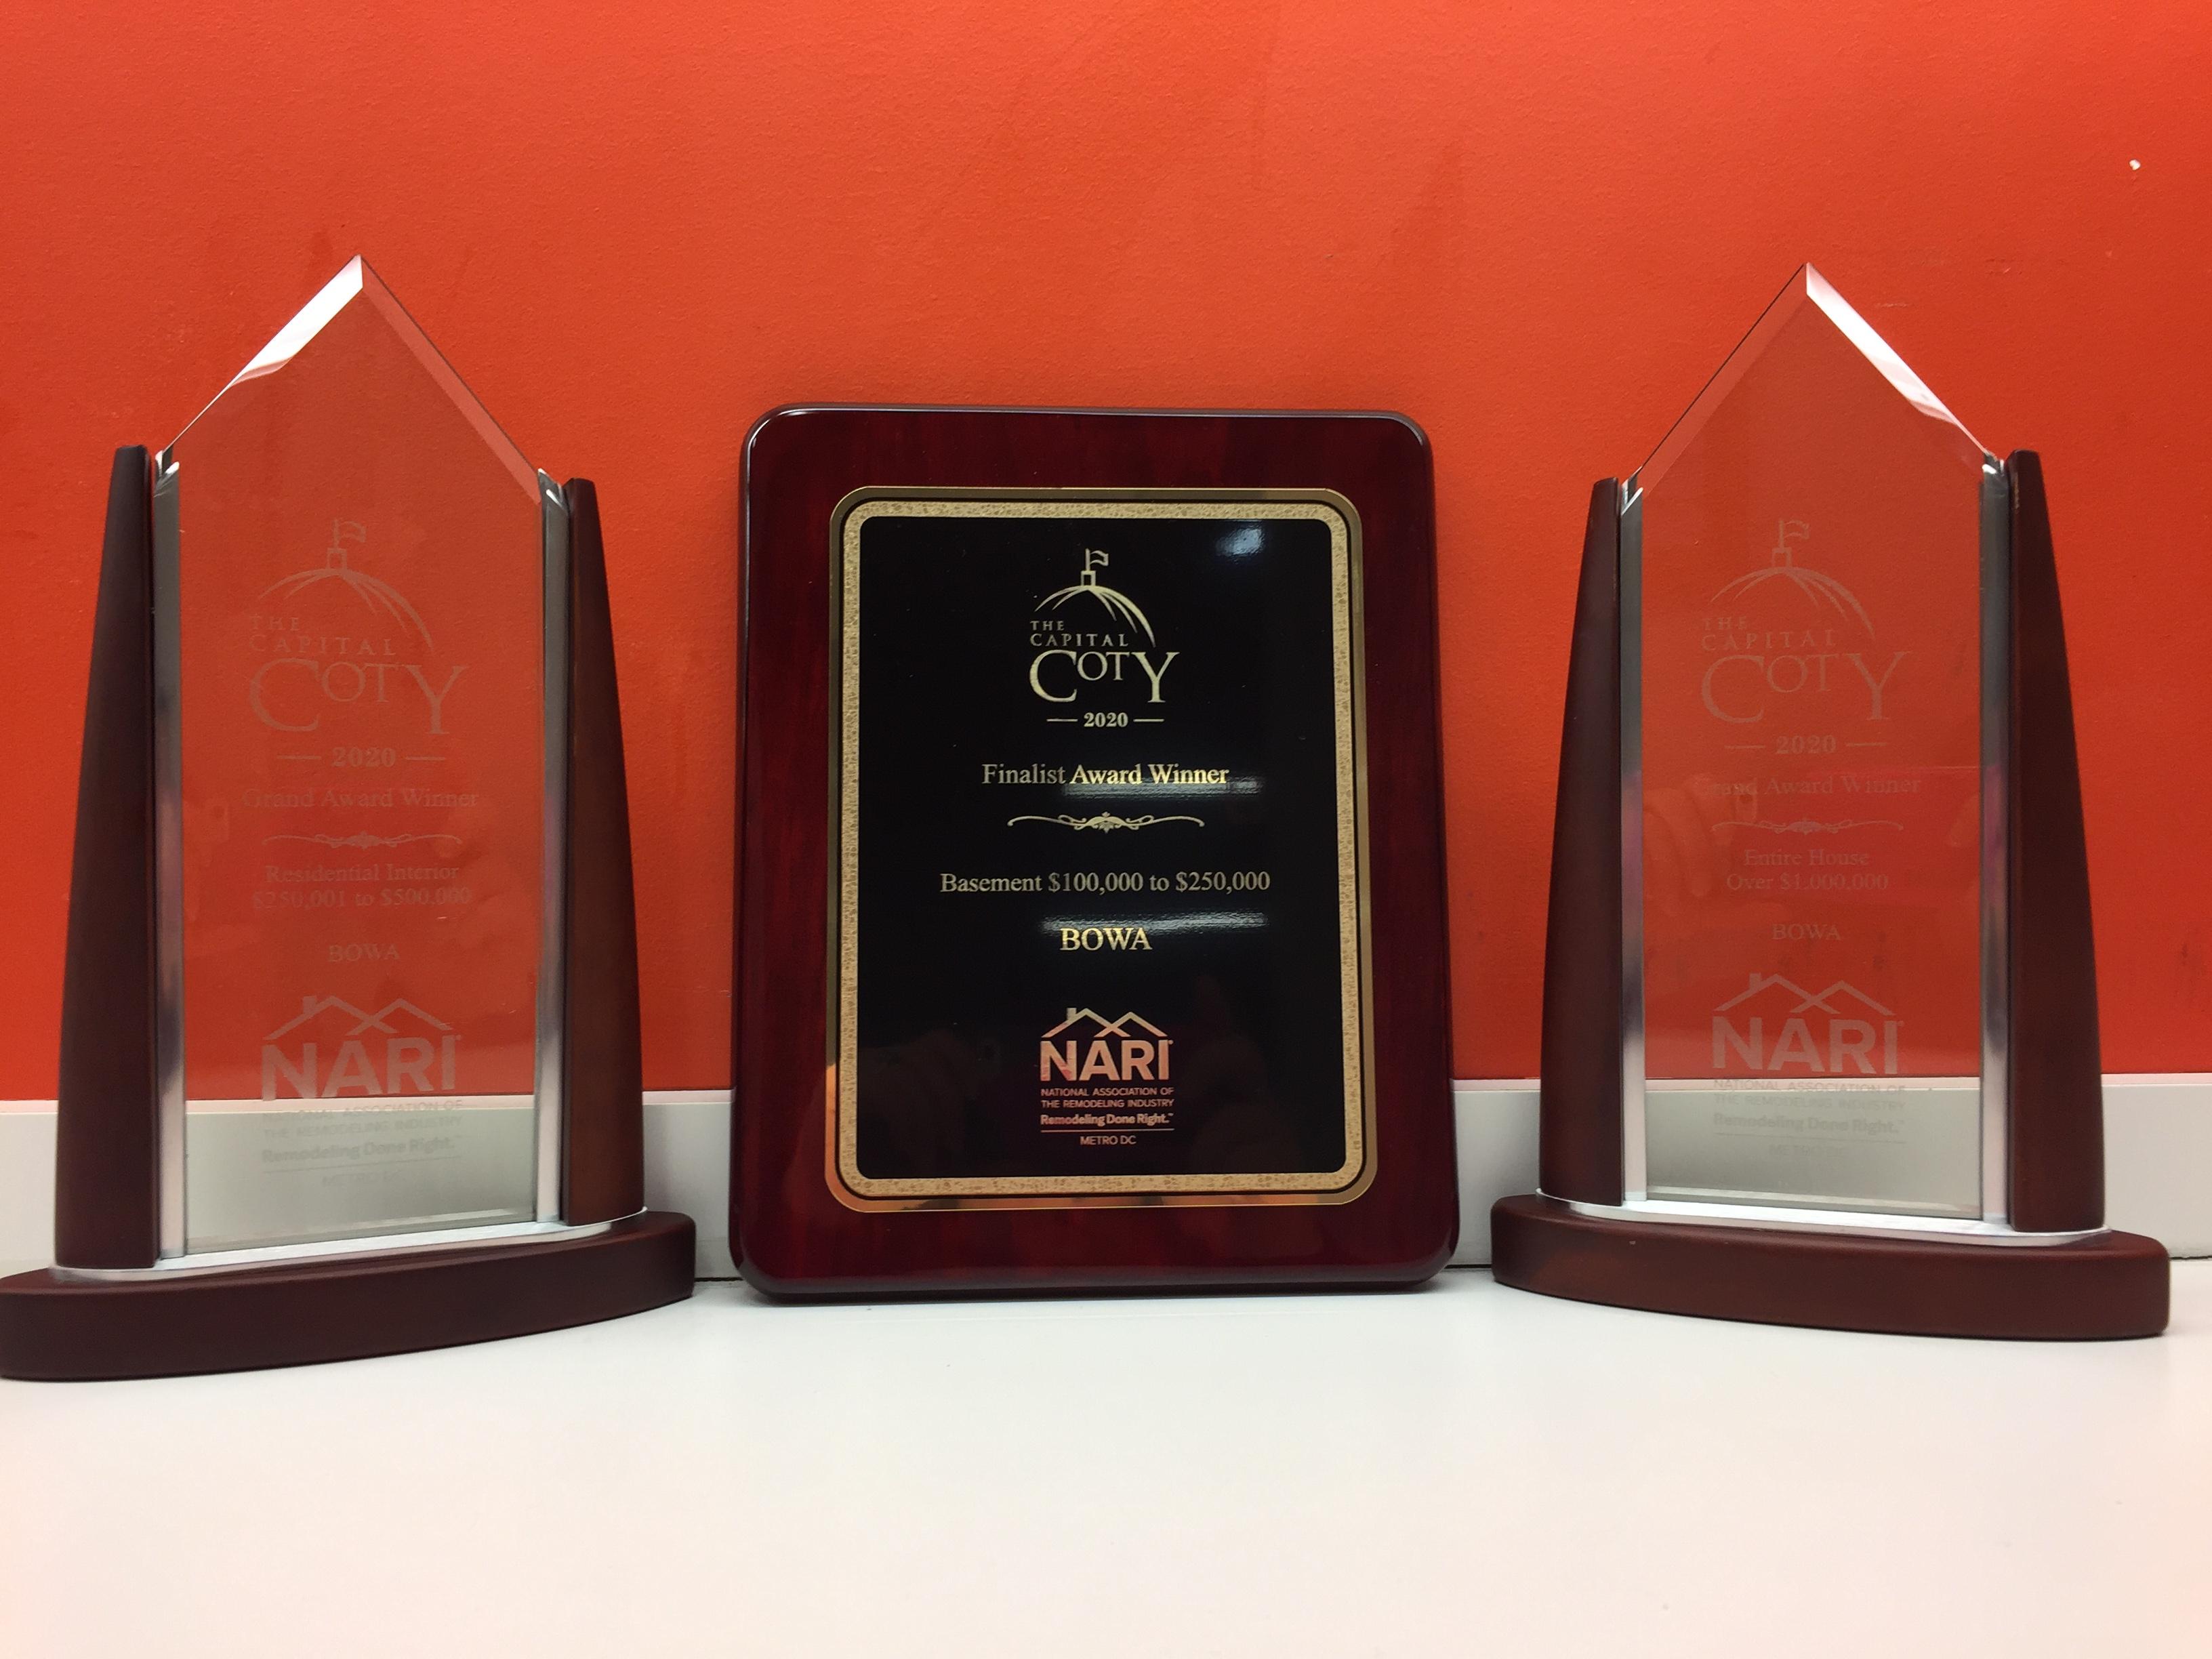 BOWA Wins Two CotY Awards